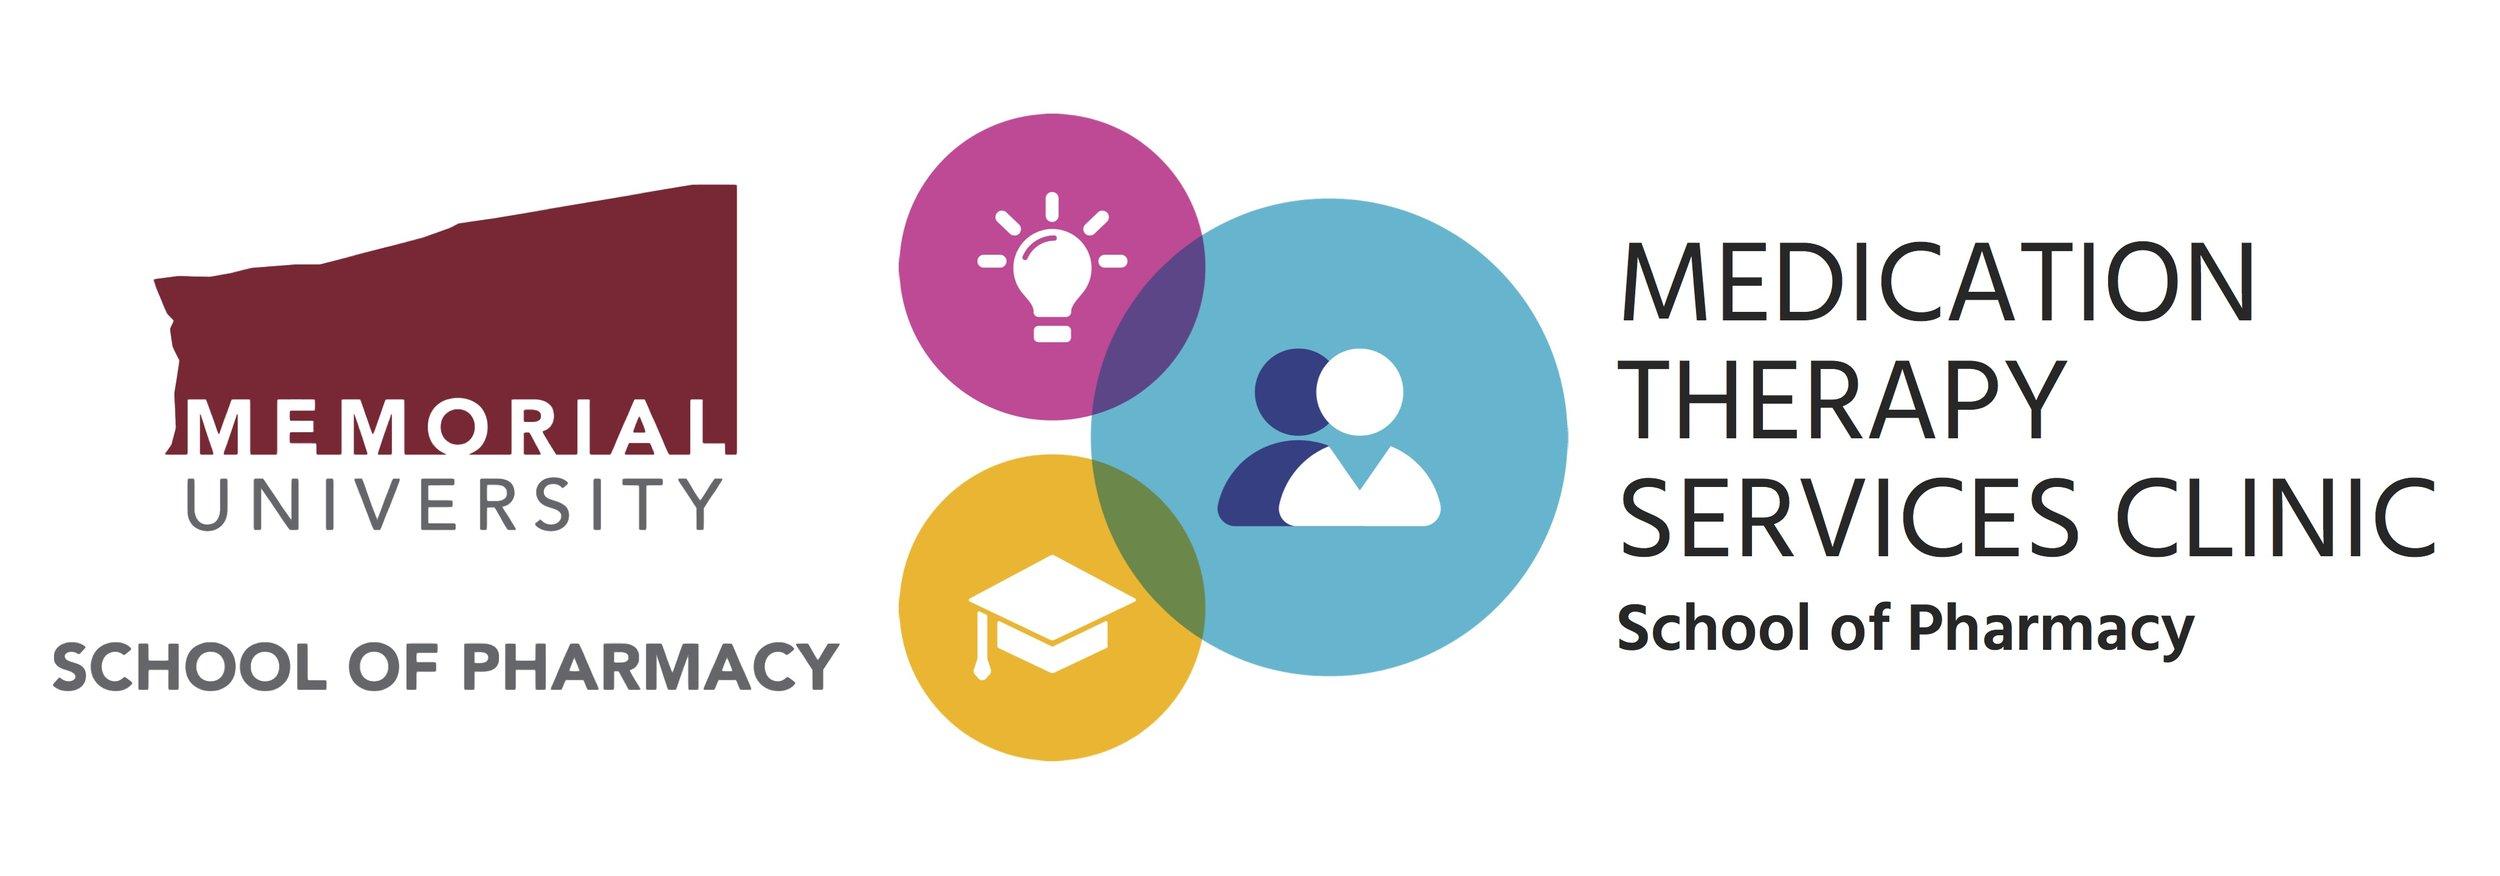 MTS SOP logo.jpg